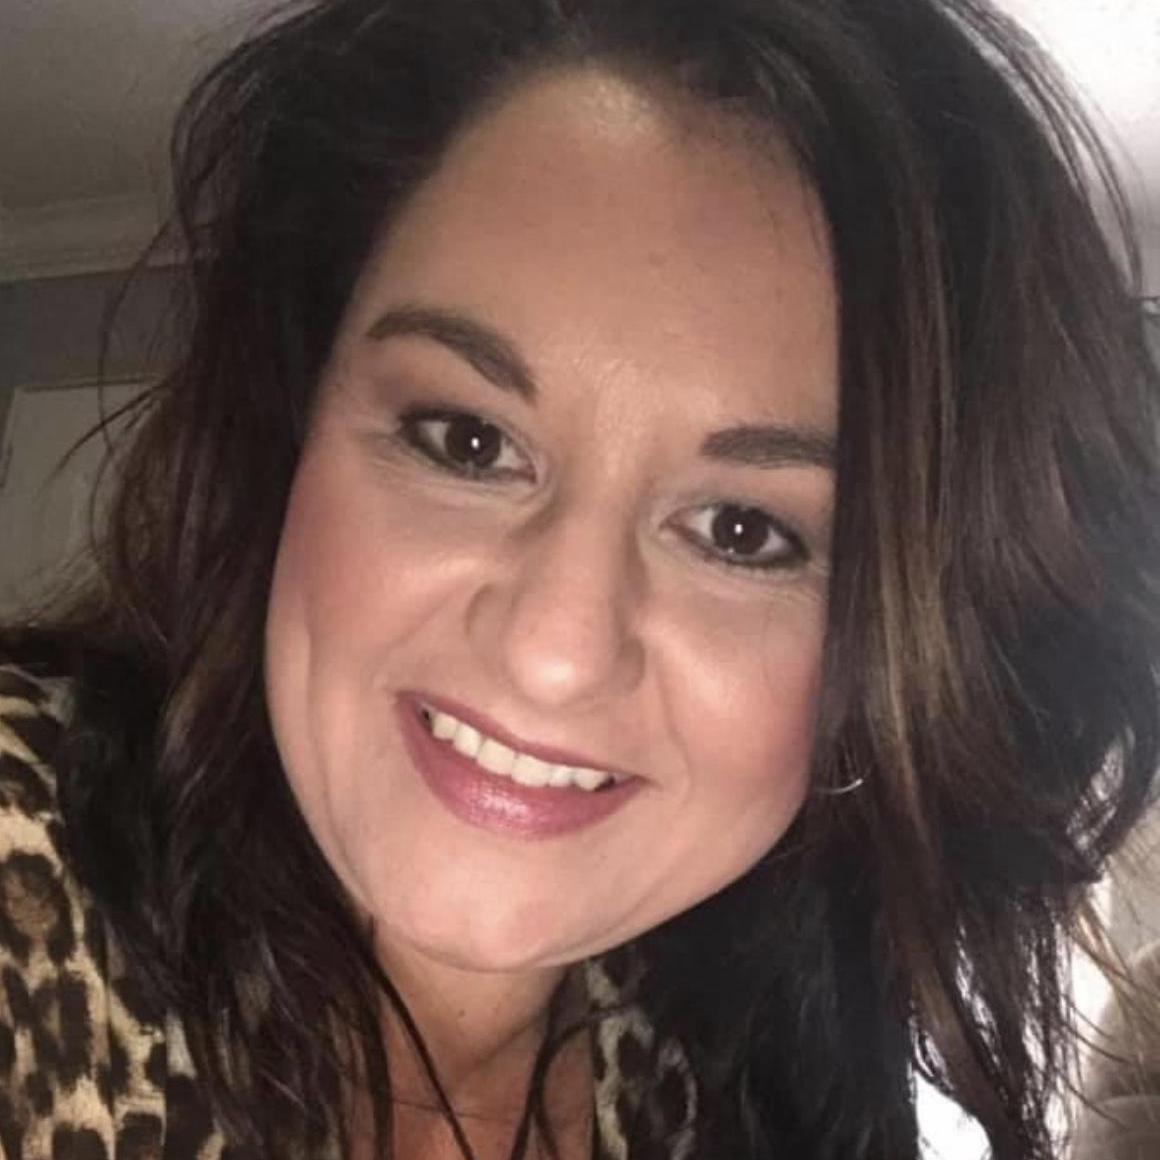 ZONA BRUNER's Profile Photo